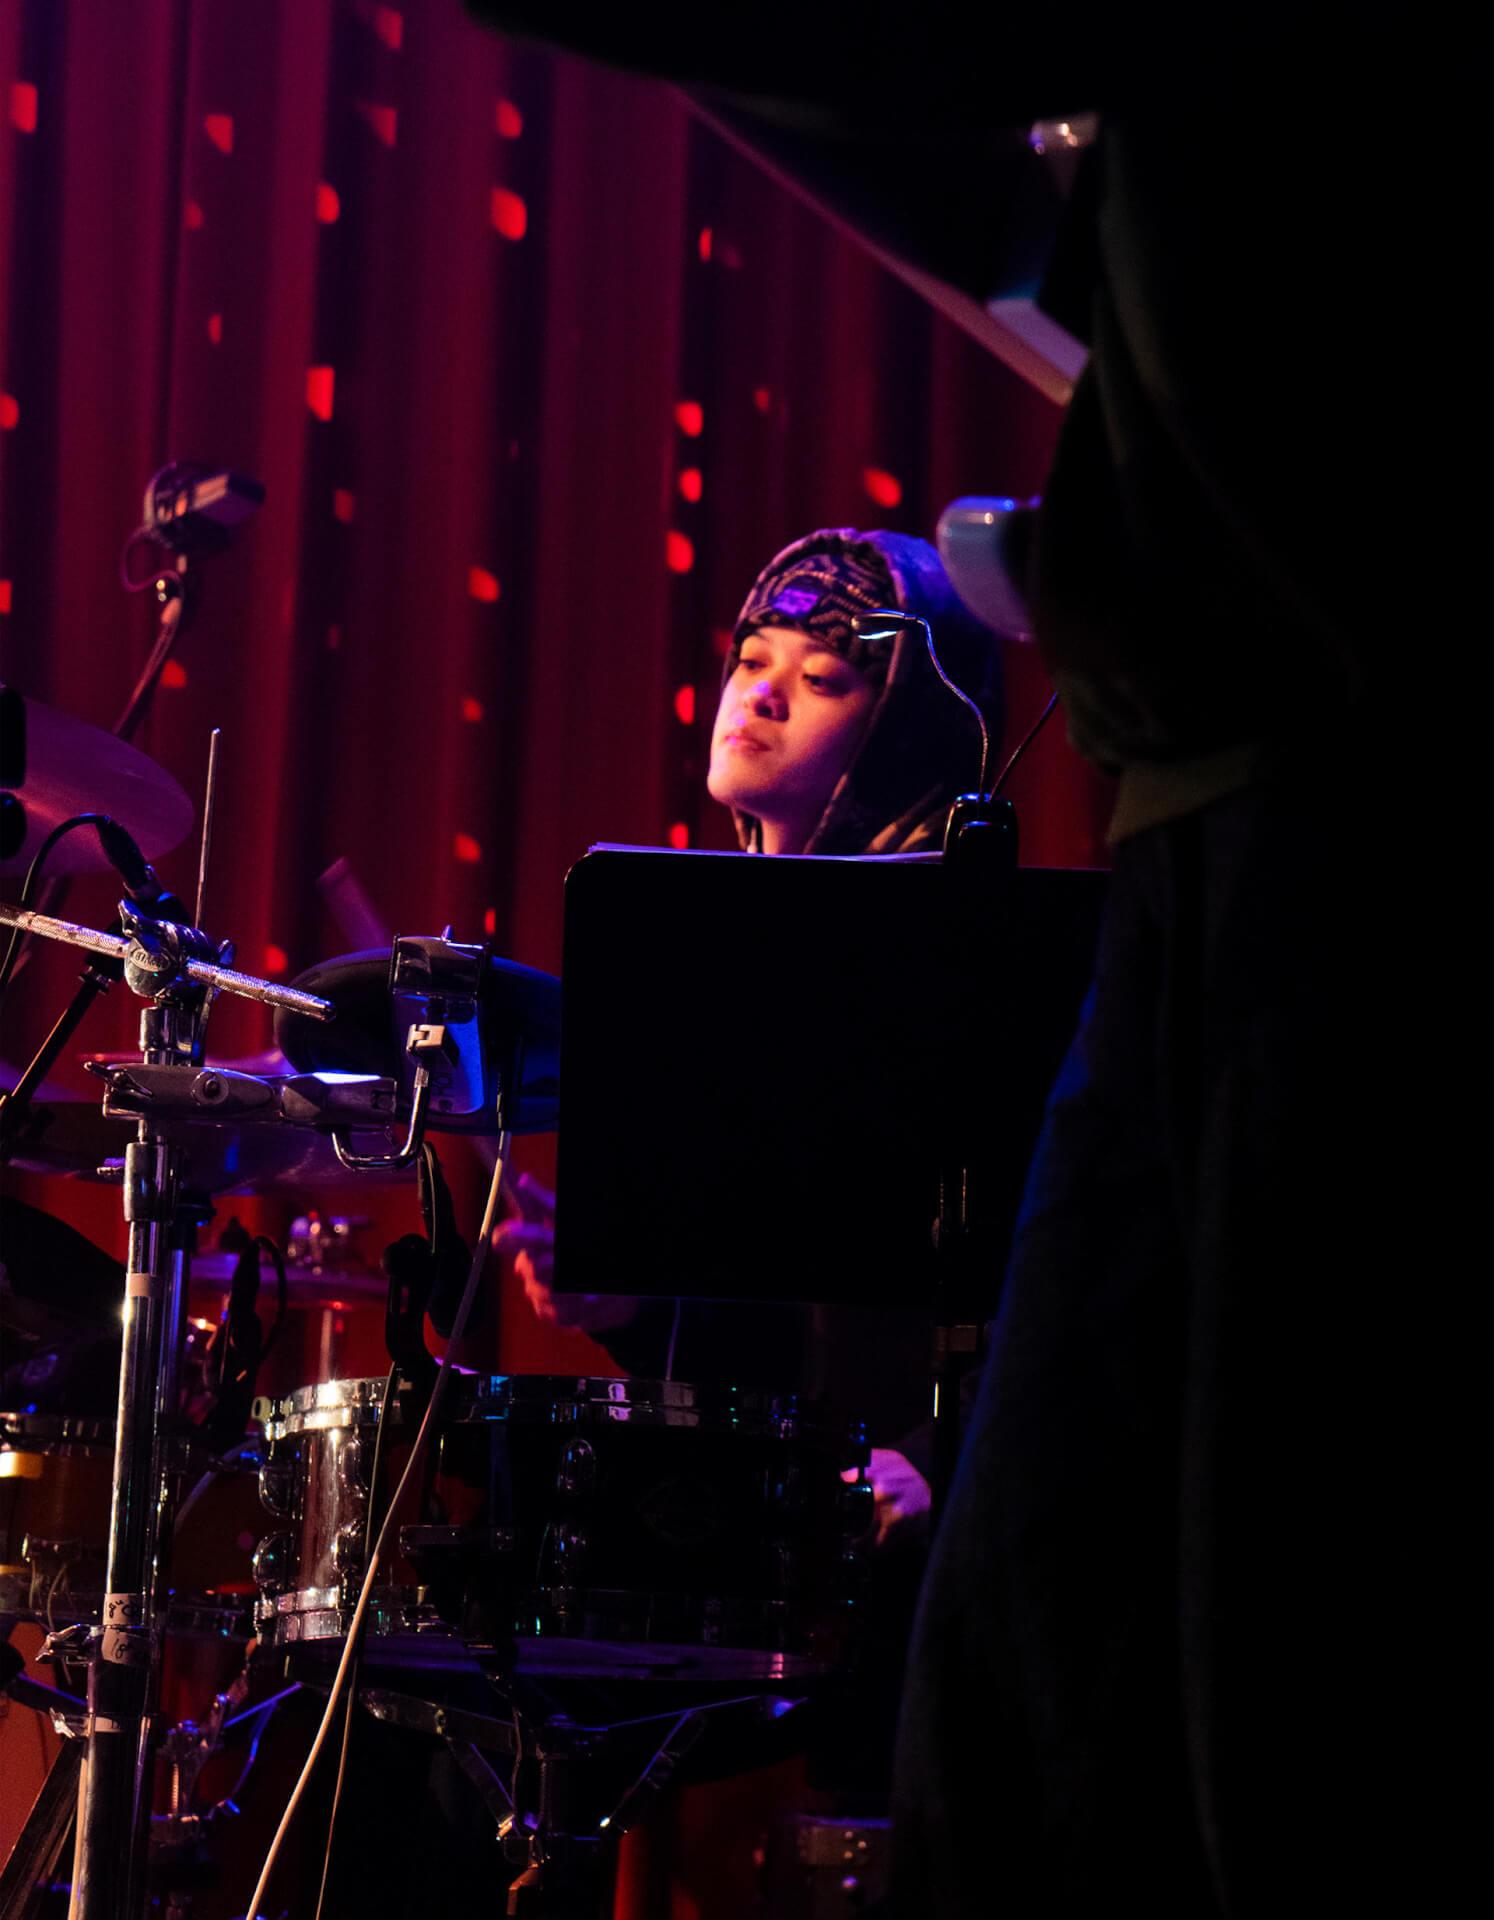 BIM初のビルボードライブ公演のライブレポートが到着!バンドセットでPUNPEE、kZm、STUTSらと共演 music201112_bim_live_1